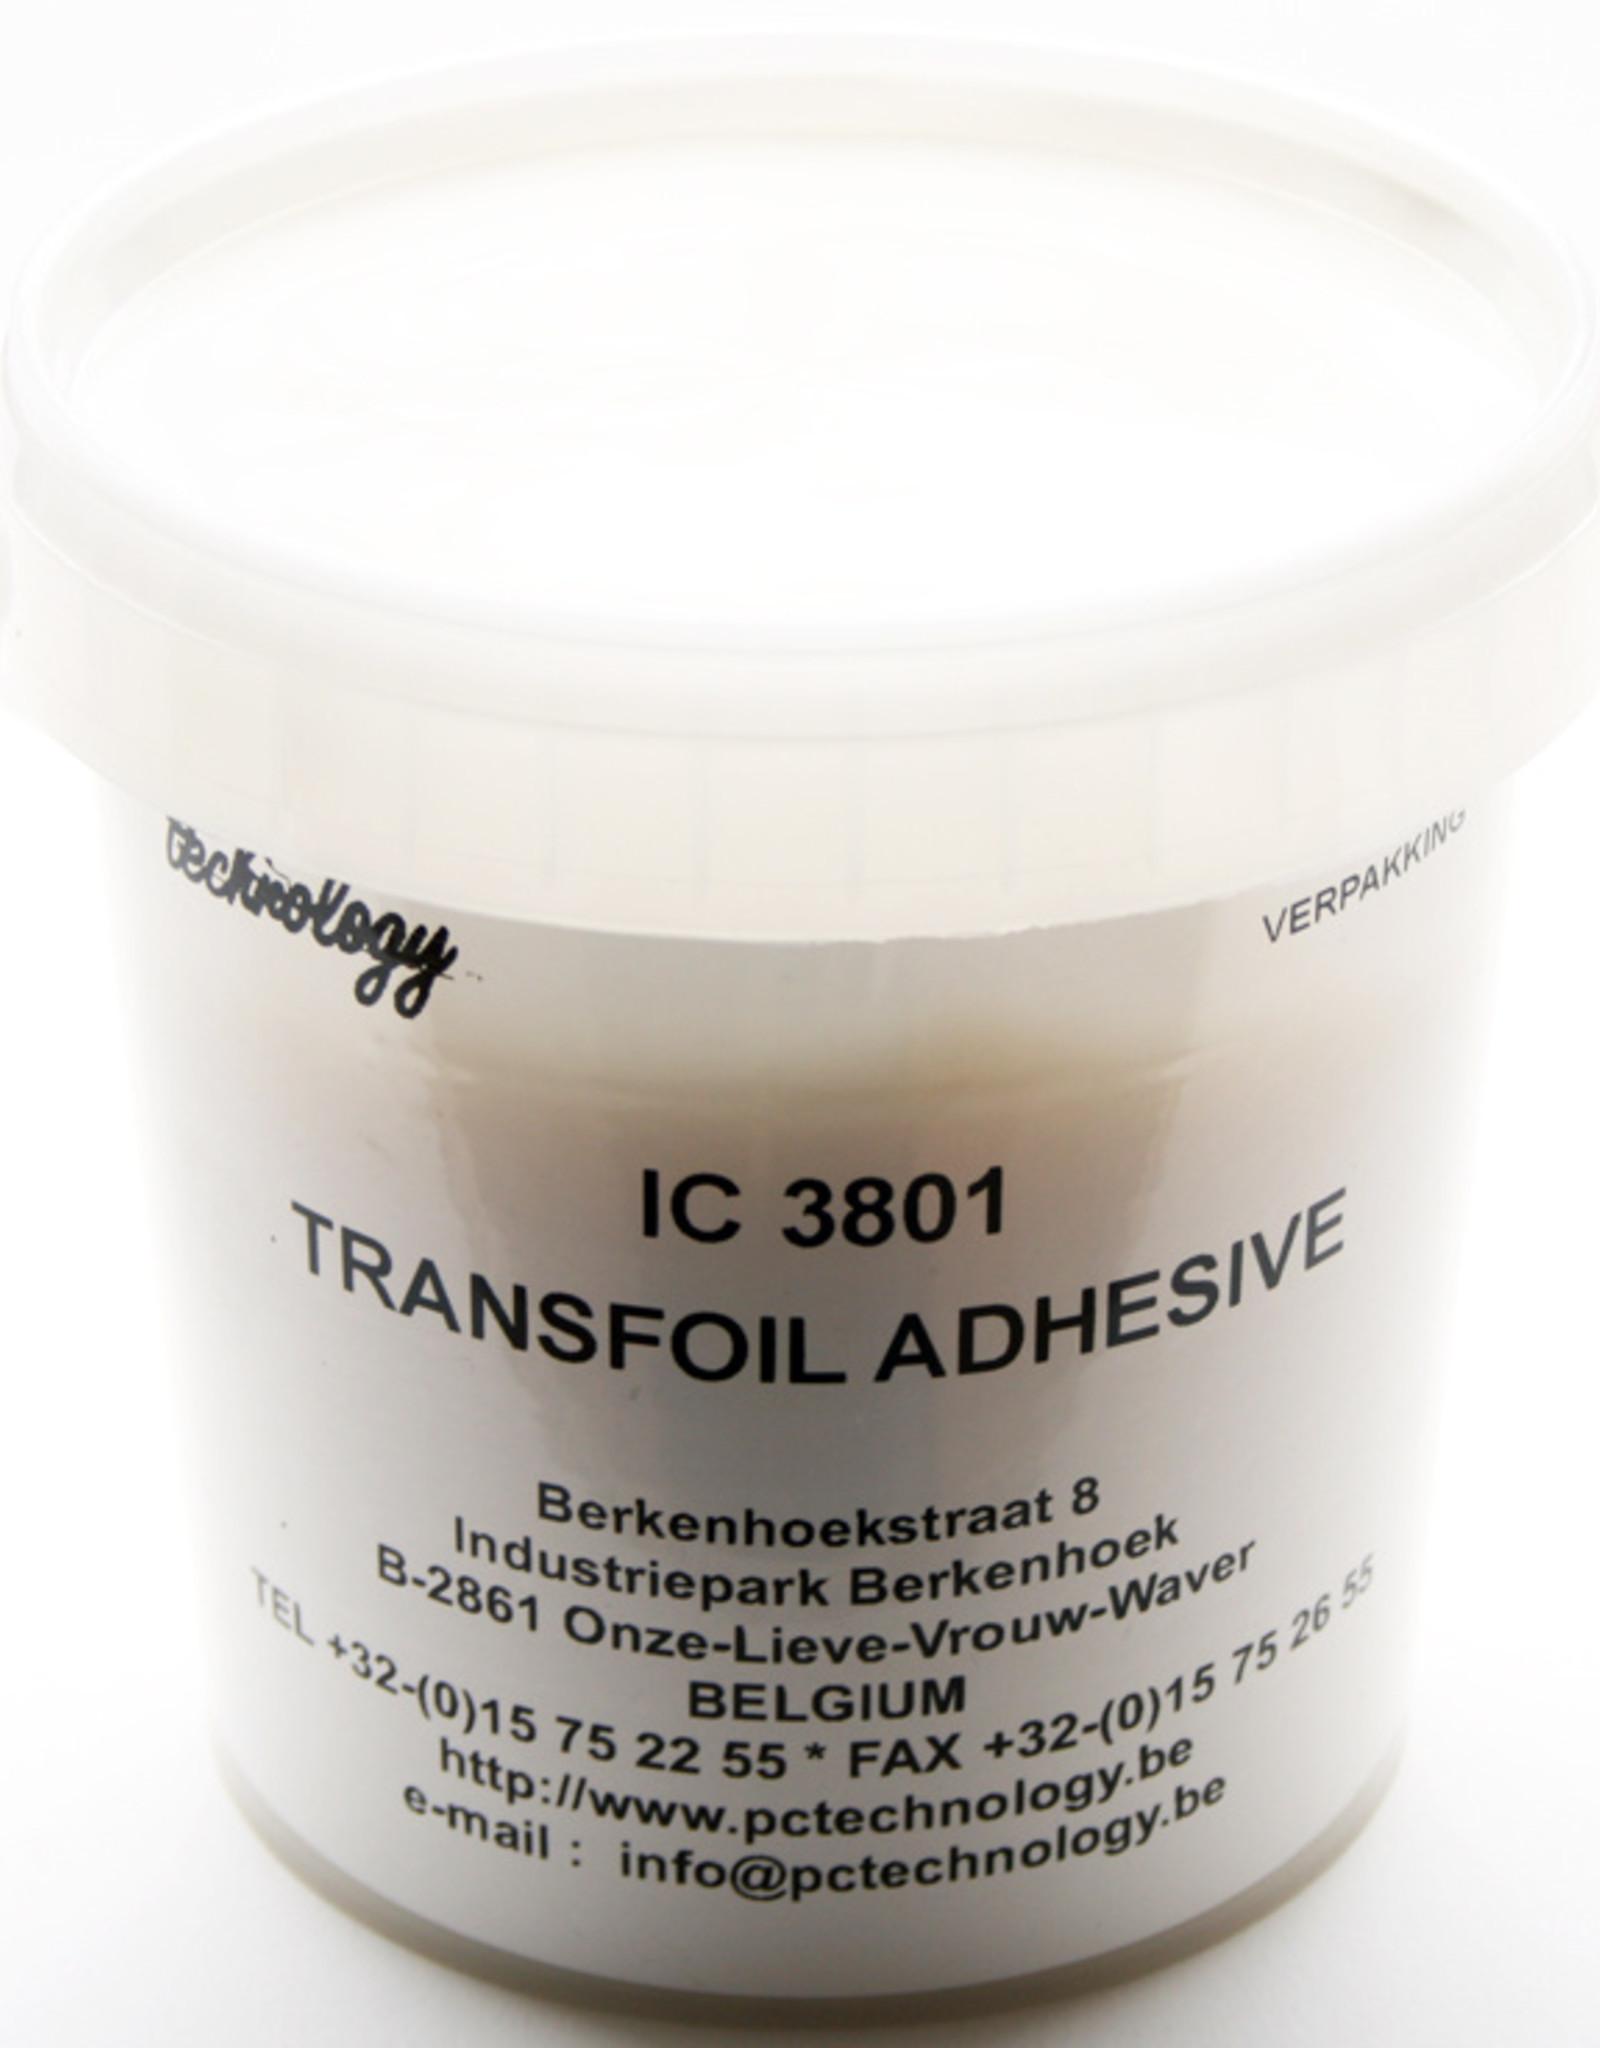 HVK Lijm voor Transferfolie IC 3801 1 liter